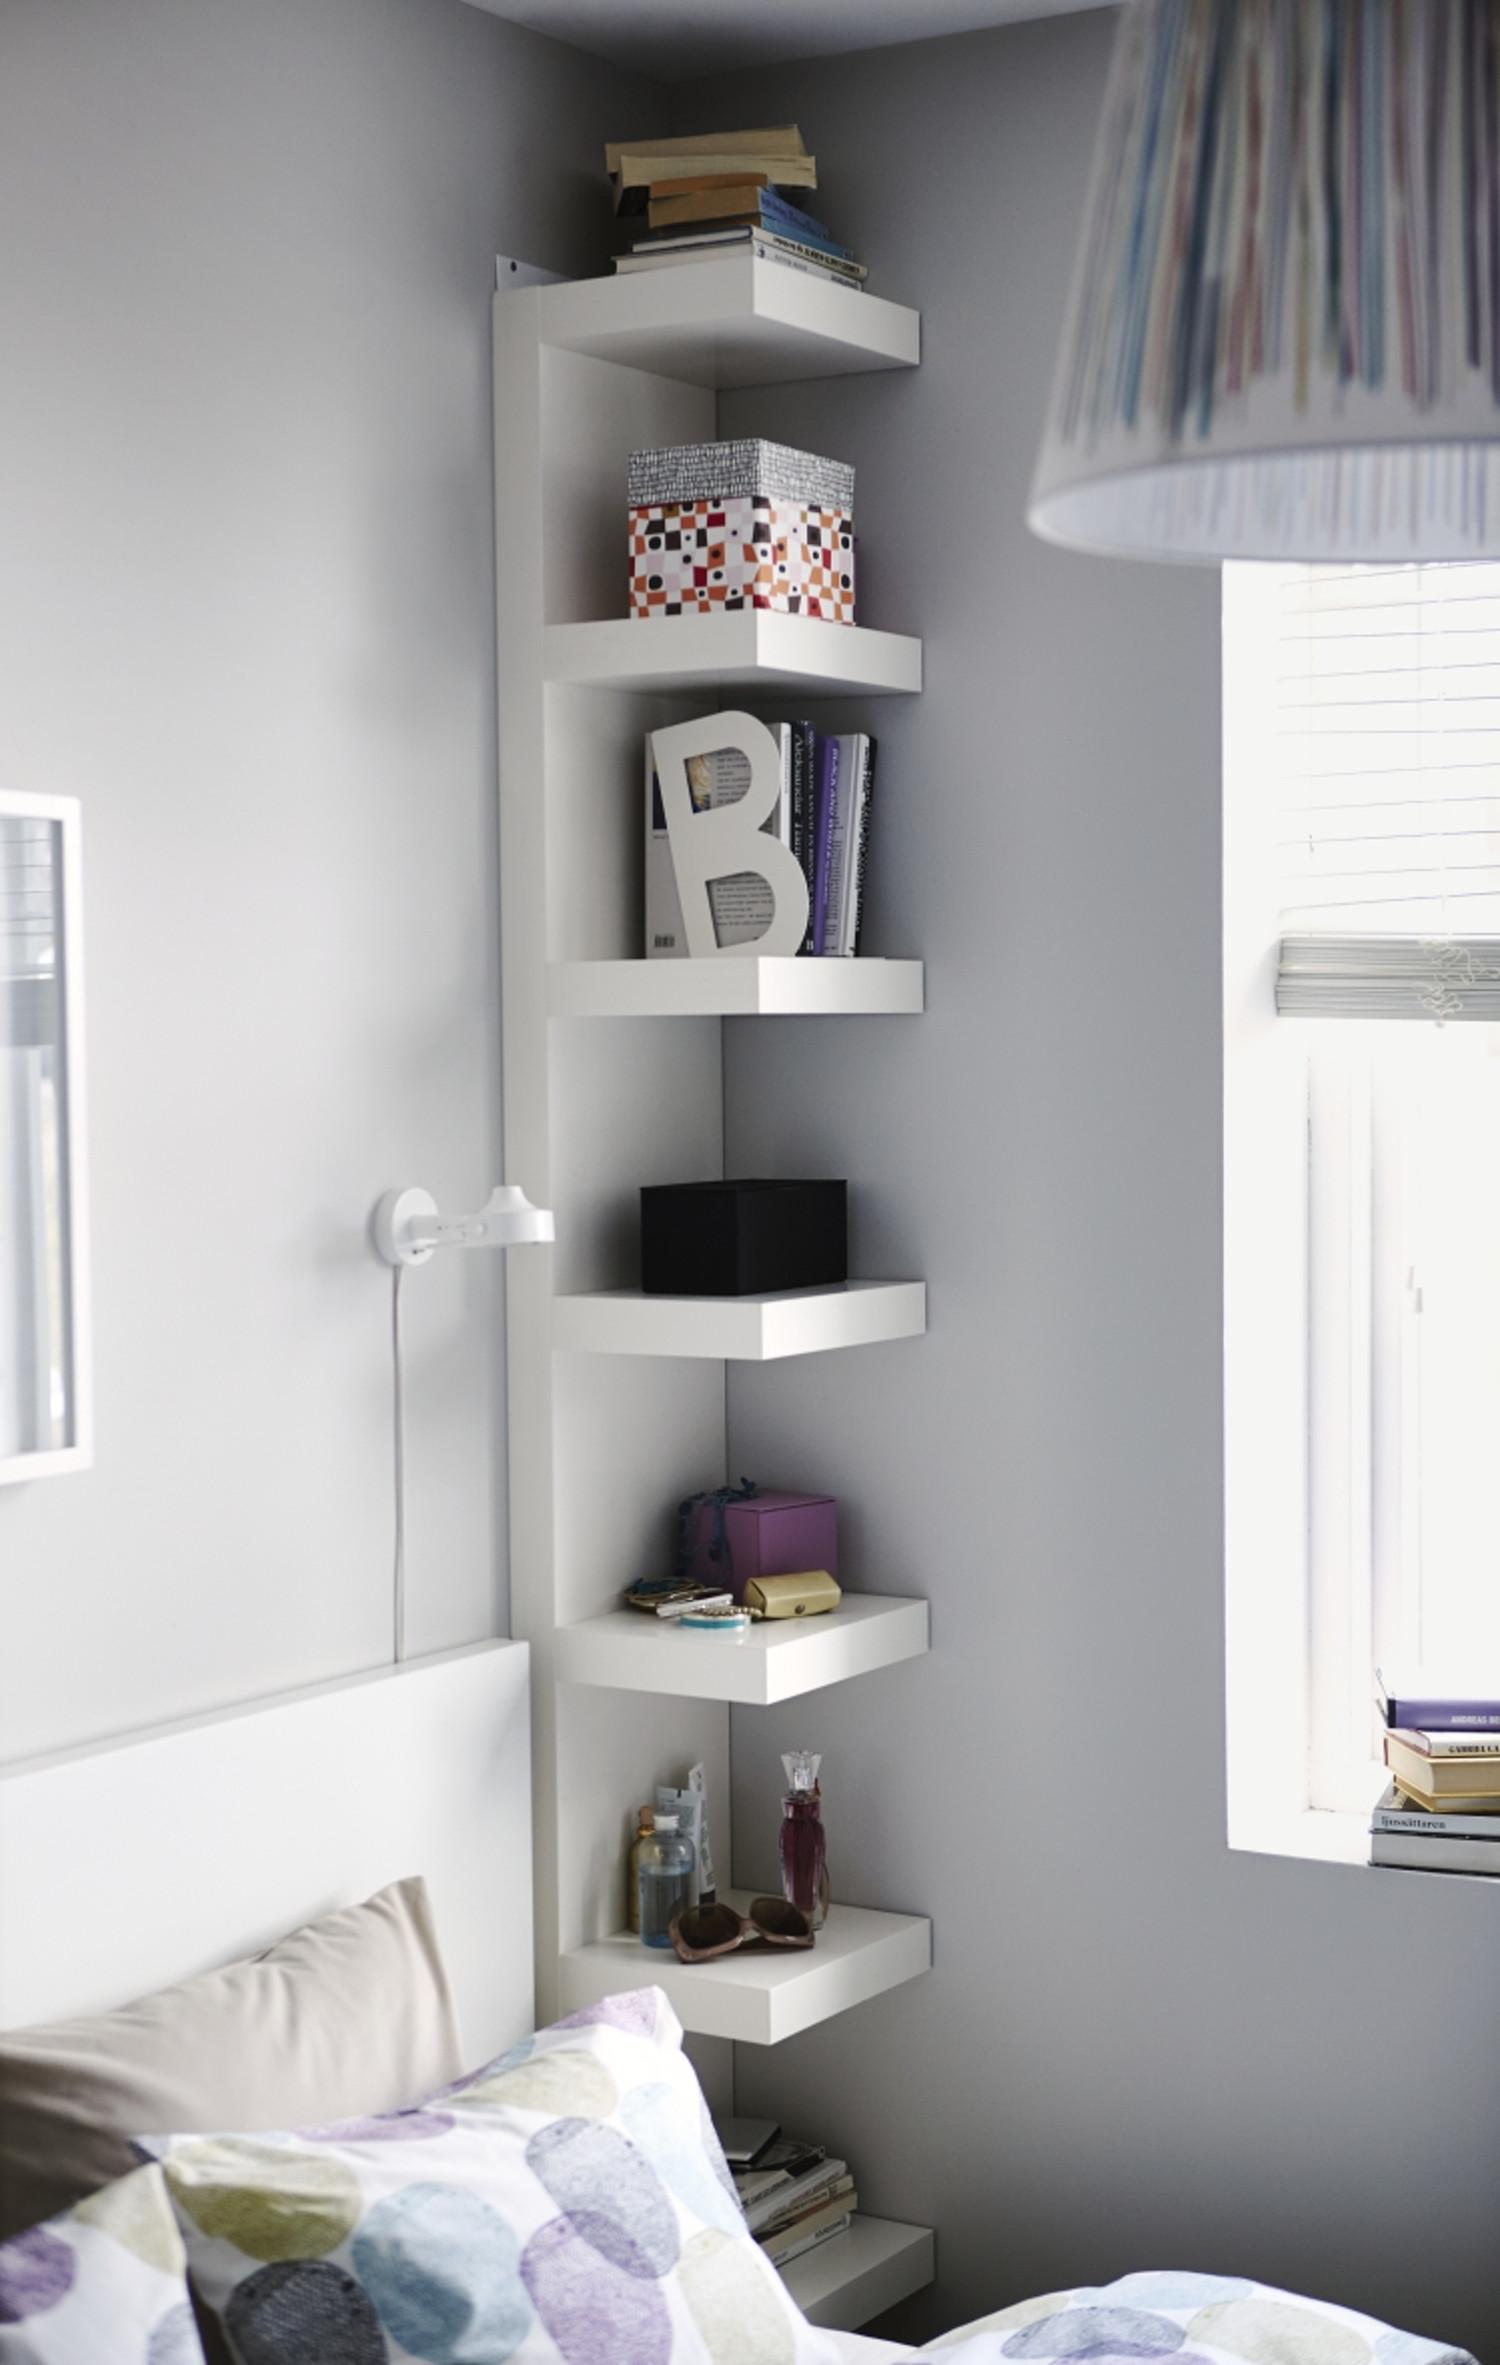 Small Shelves for Bedroom Inspirational E Shelf 5 Ways the Endlessly Versatile Lack Wall Shelf